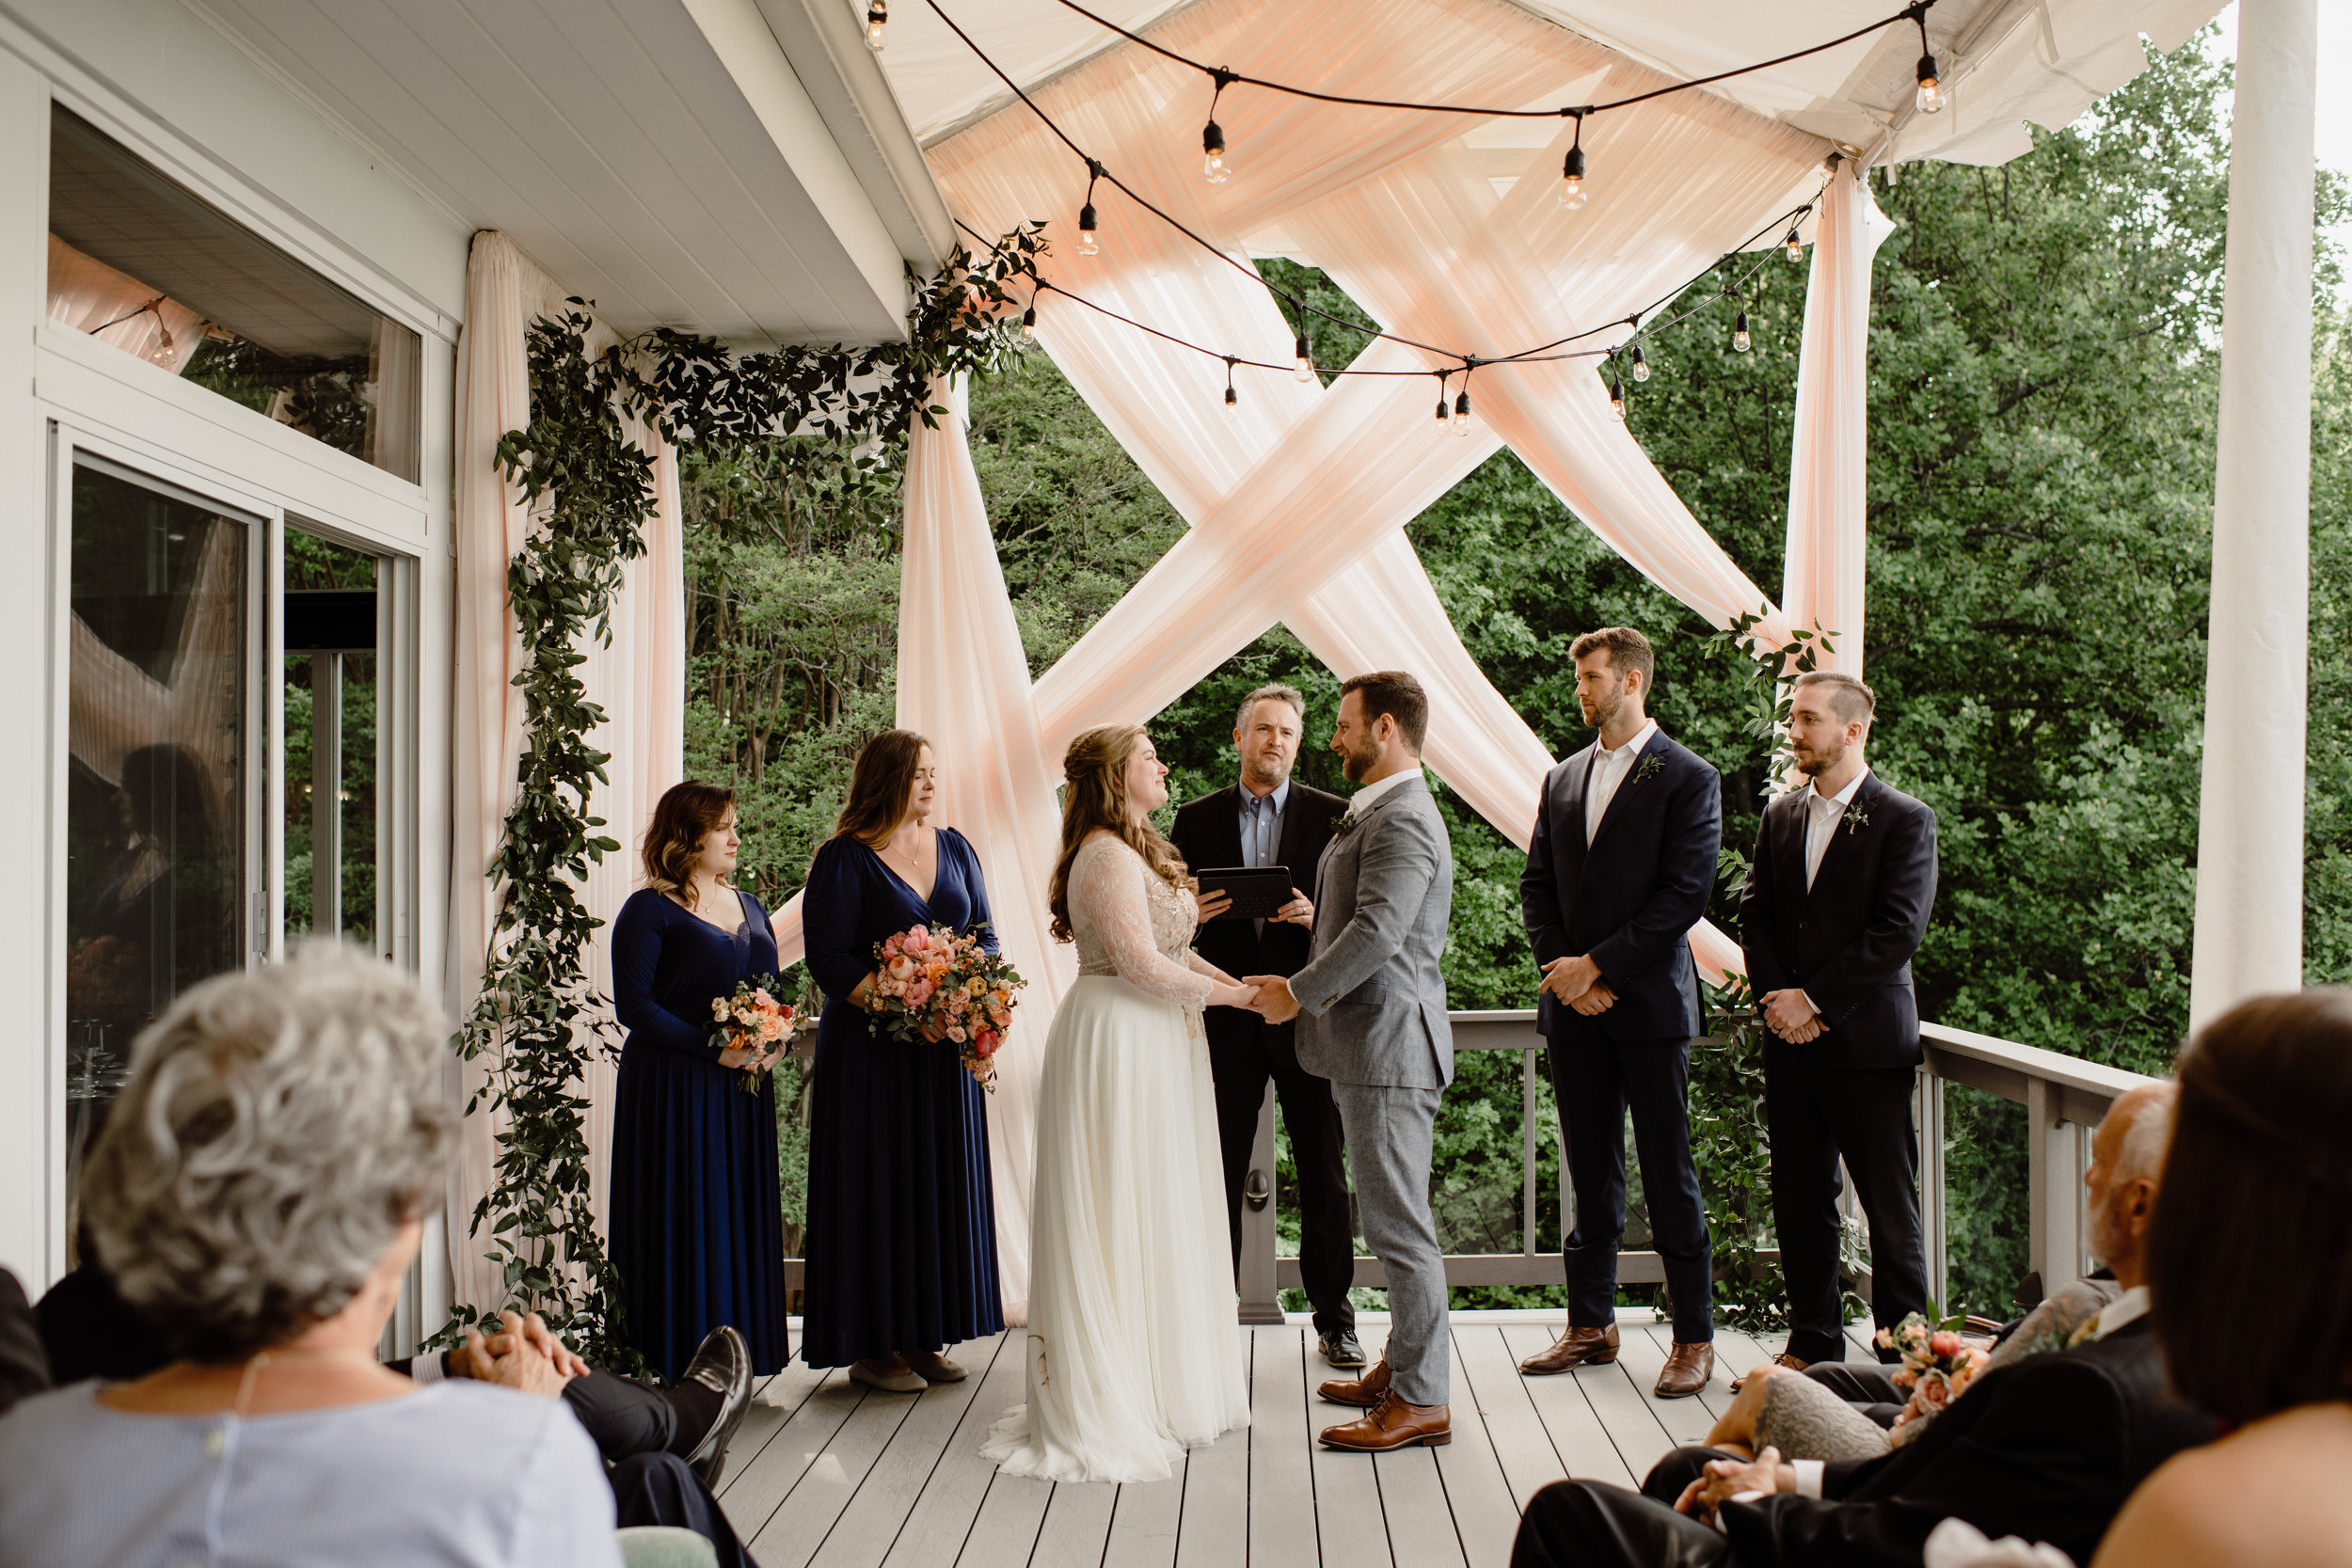 Elizabeth and Aldens Intimate Backyard wedding in Nashville Tennessee Wedding Photographer00016.jpg